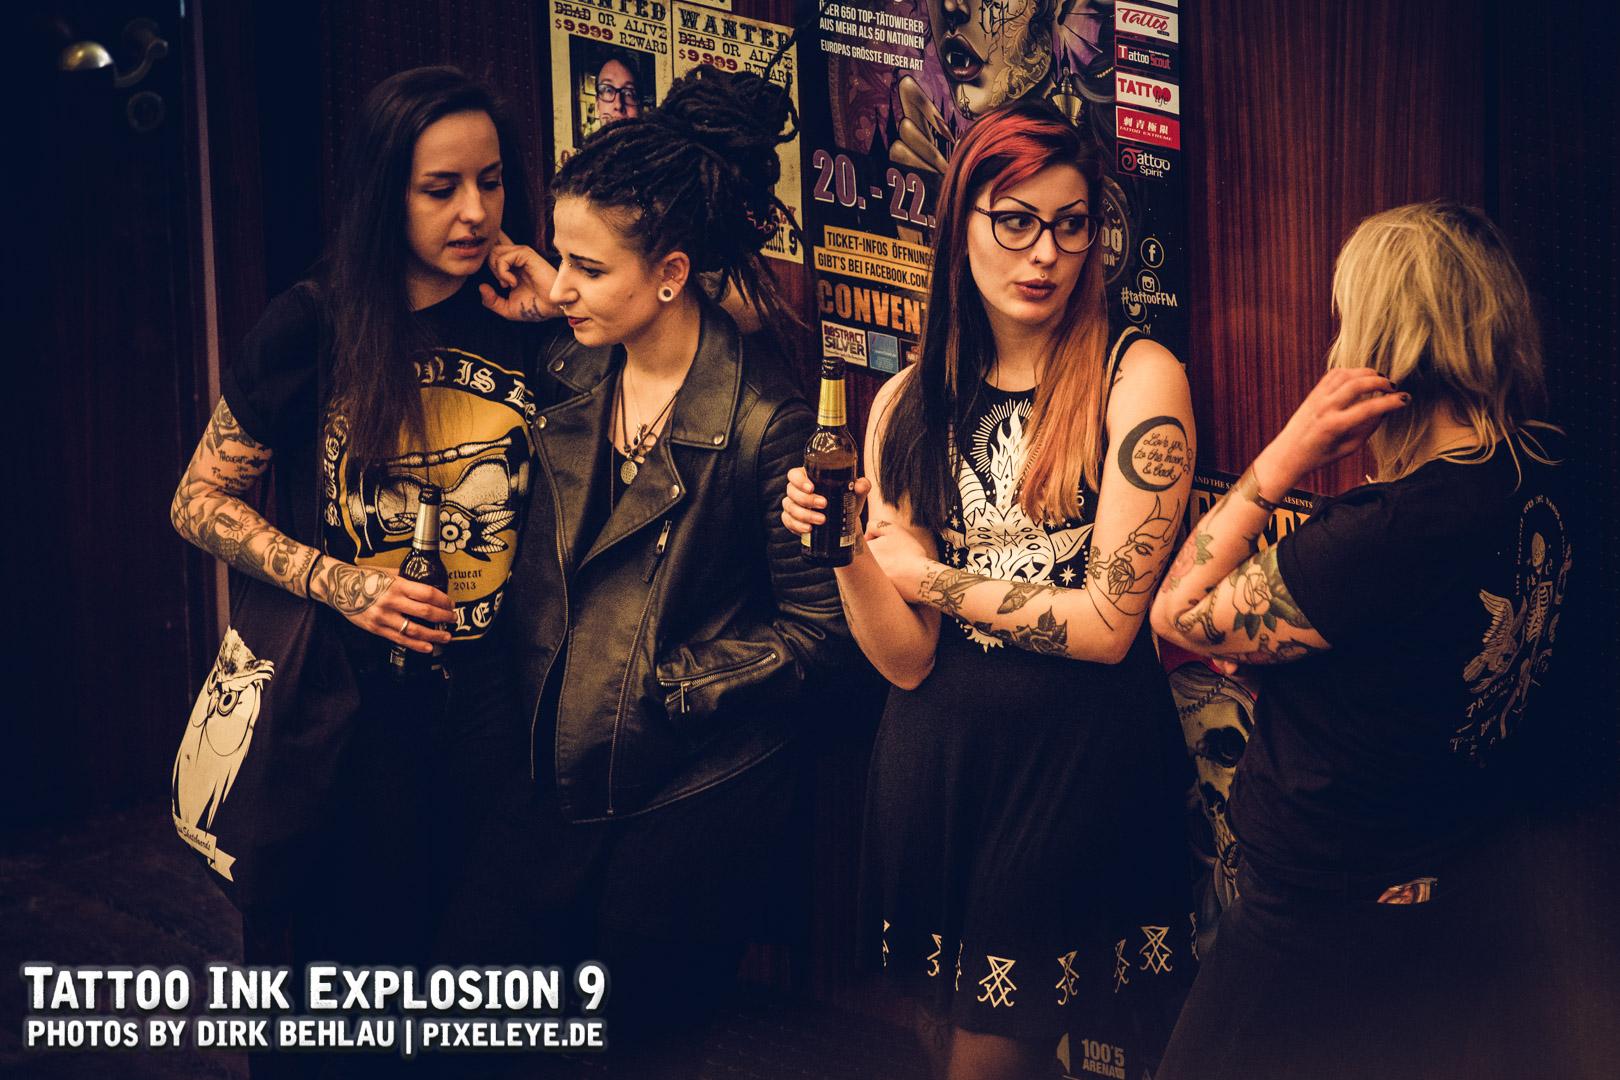 Tattoo Ink Explosion 2018 WEB by Dirk Behlau-1430.jpg